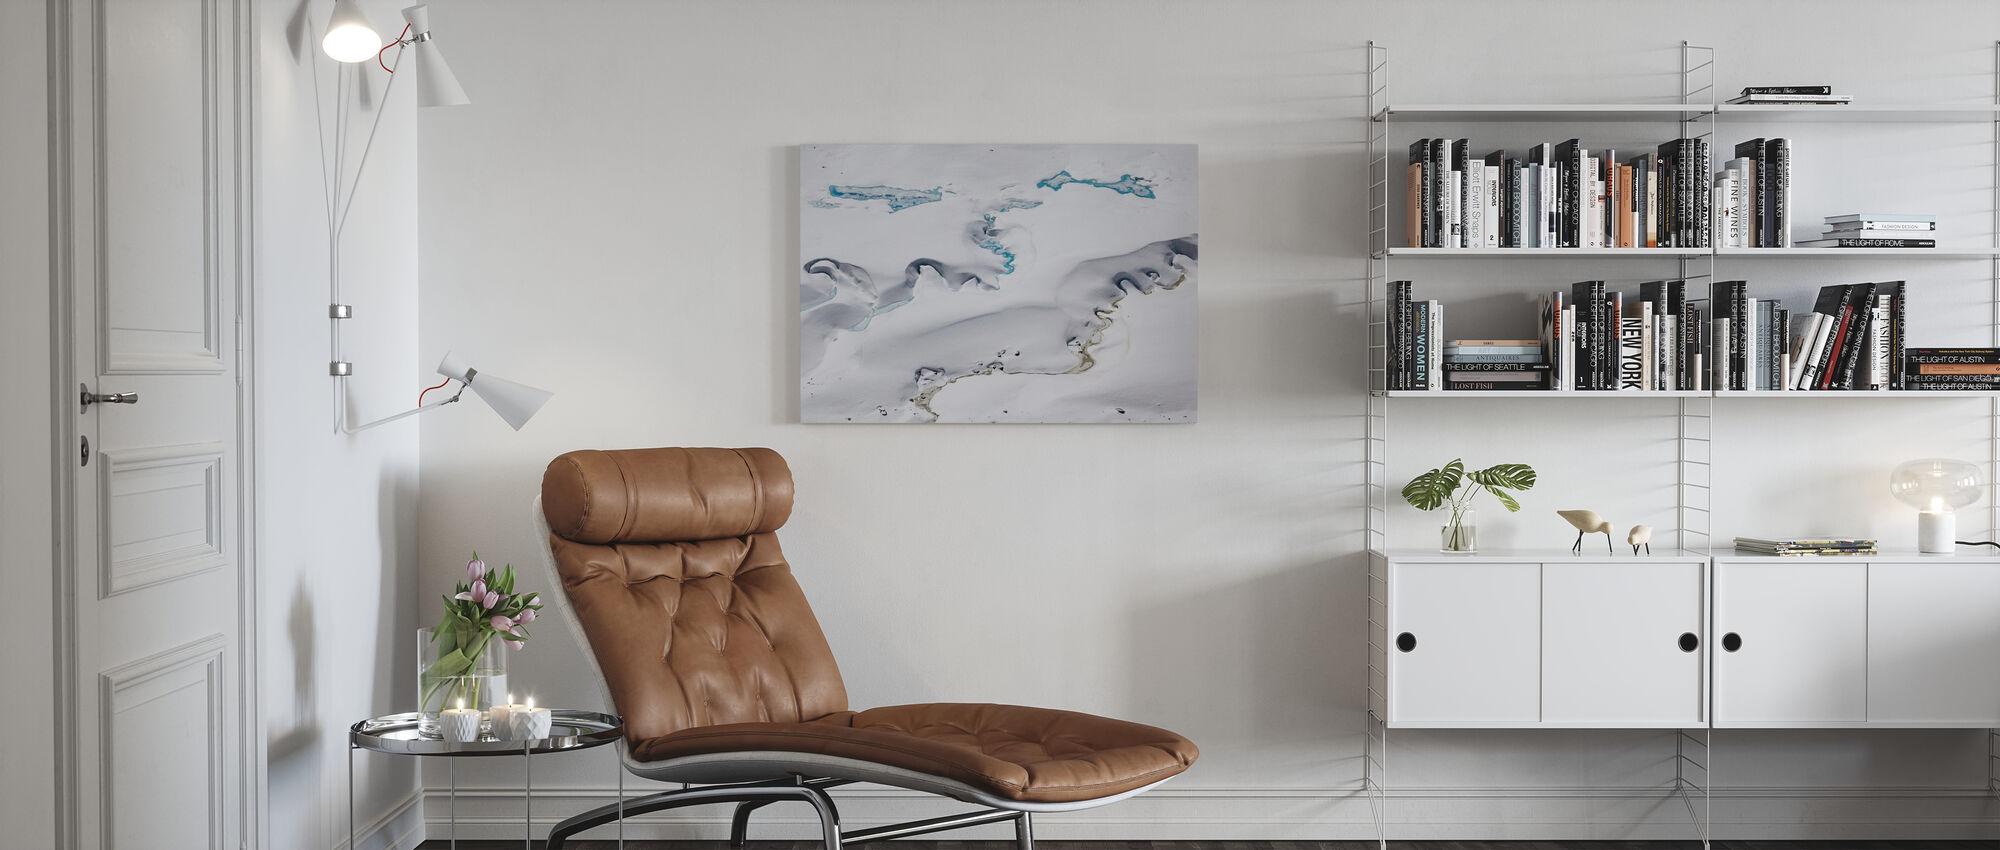 Gorner Glacier with Meltwater Channels - Canvas print - Living Room